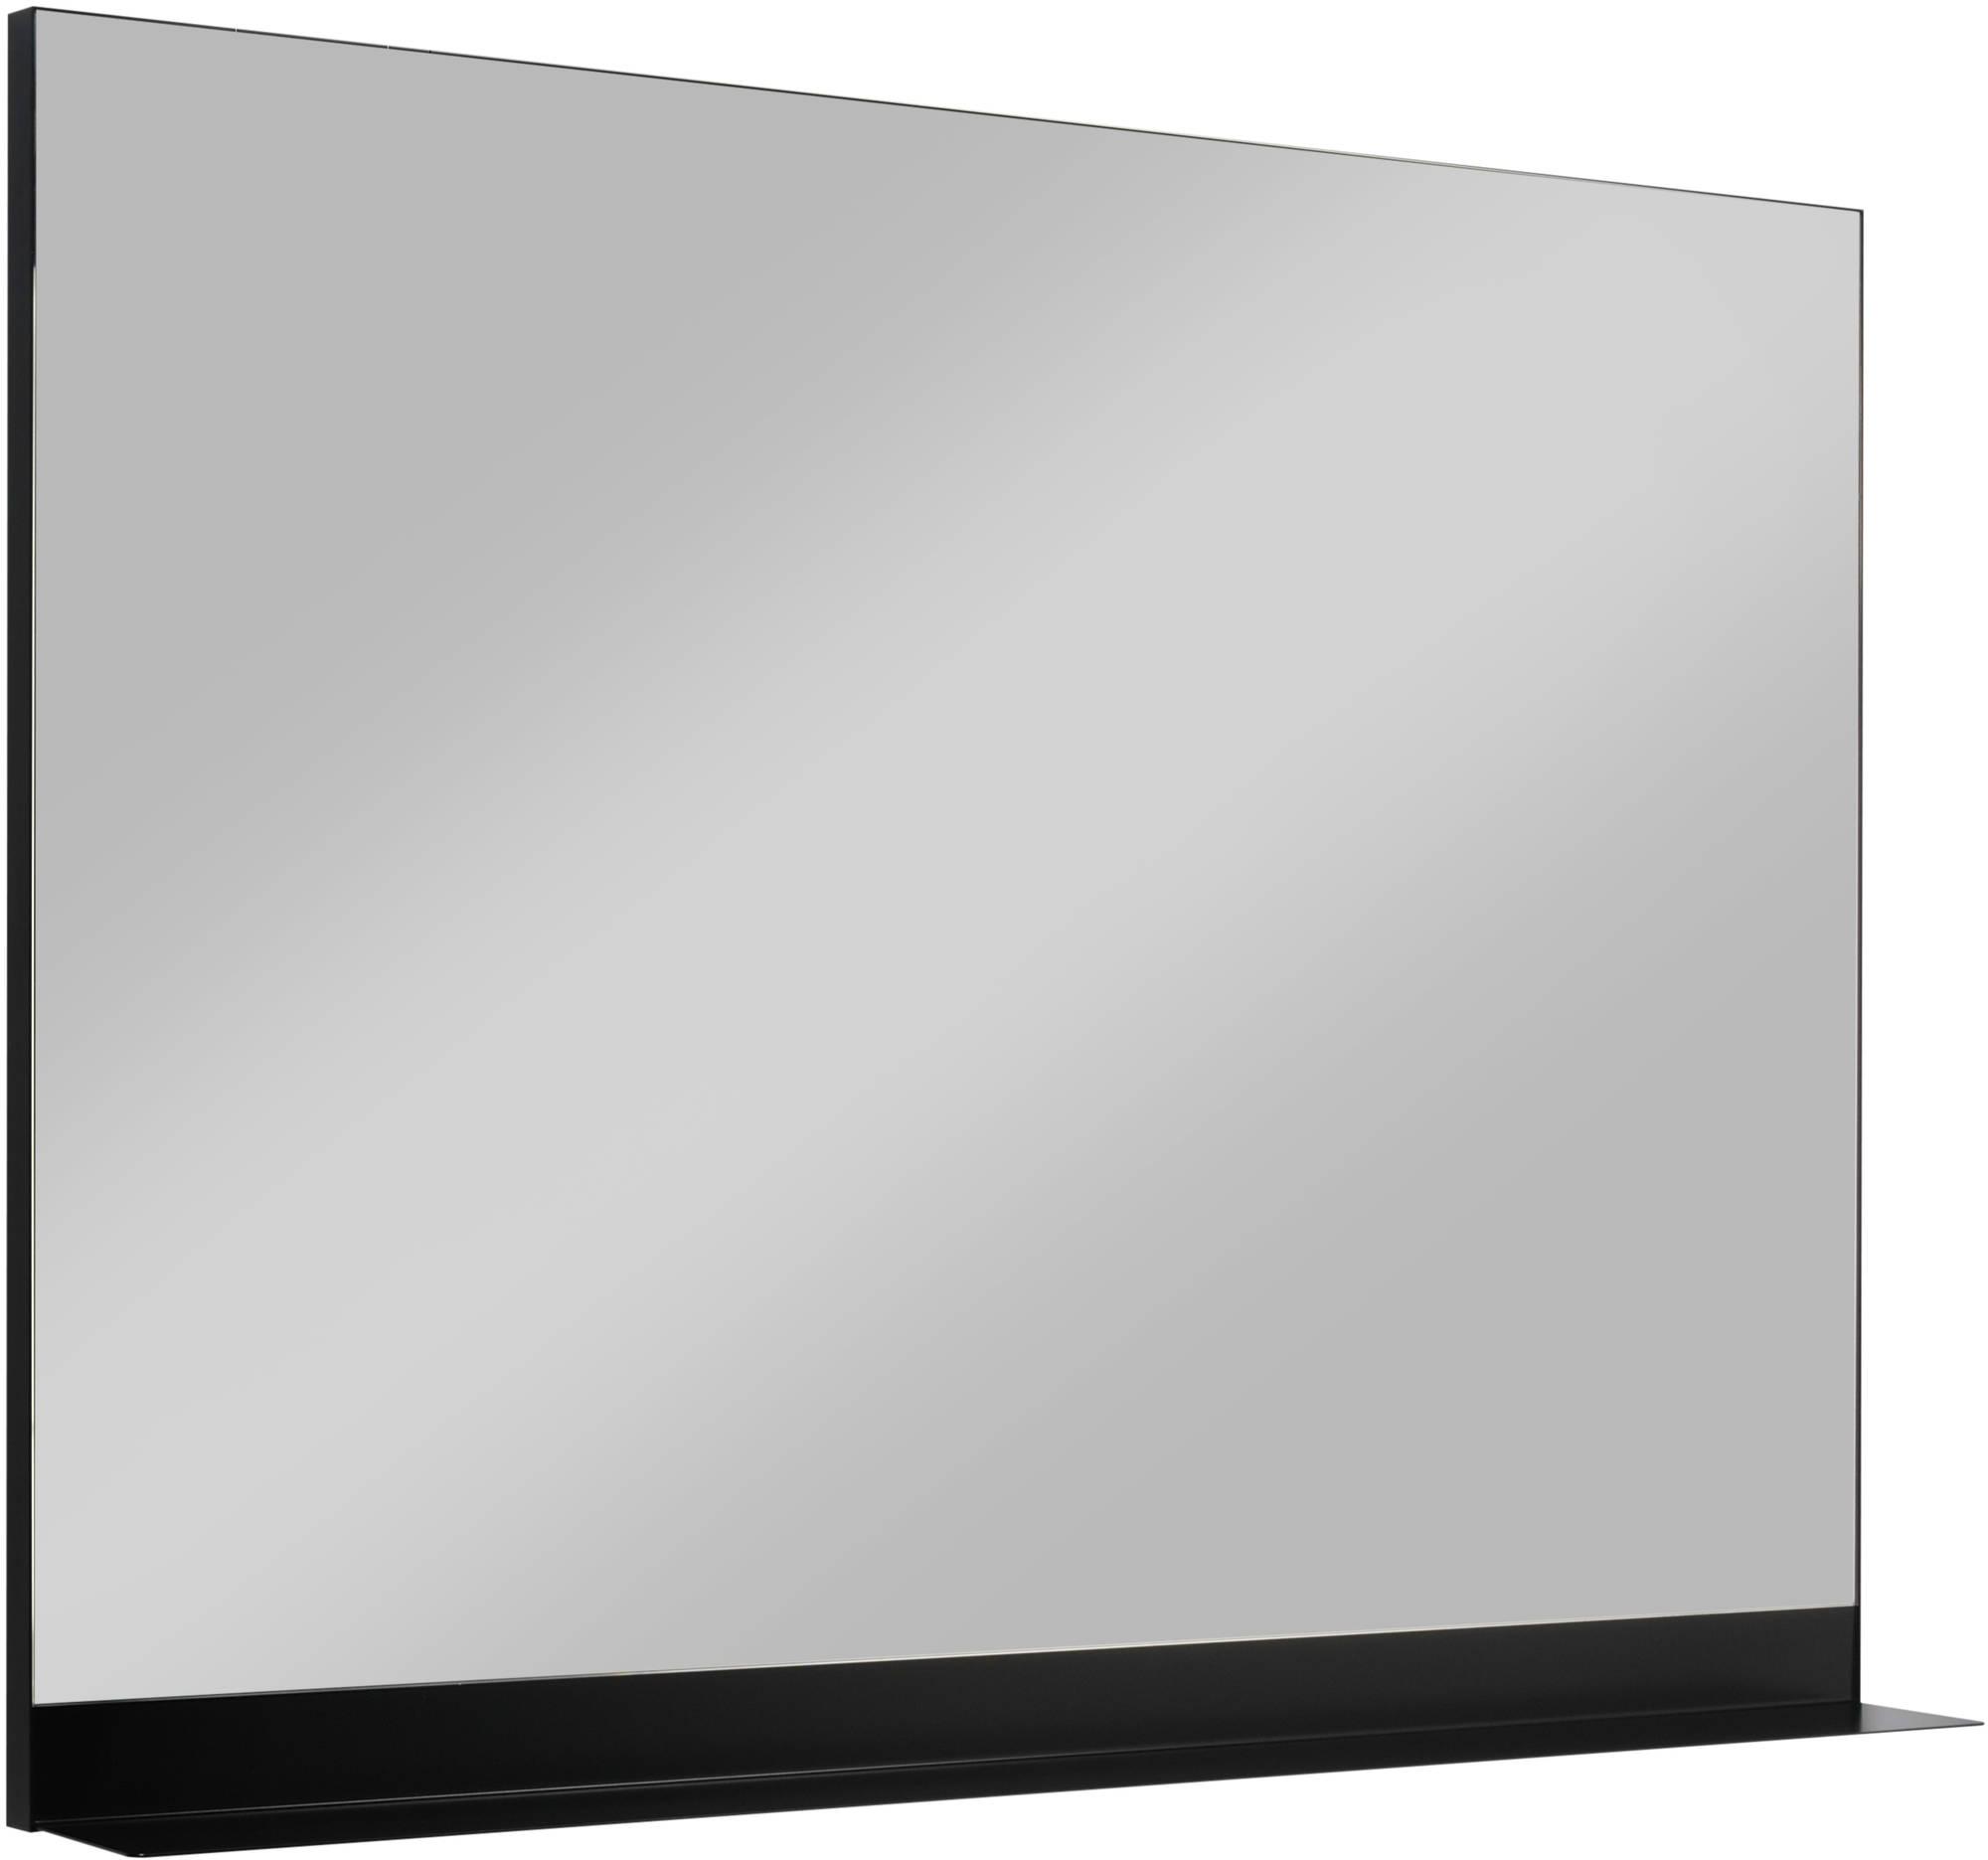 Ben Fossano spiegel met mat zwarte planchet 60x75cm